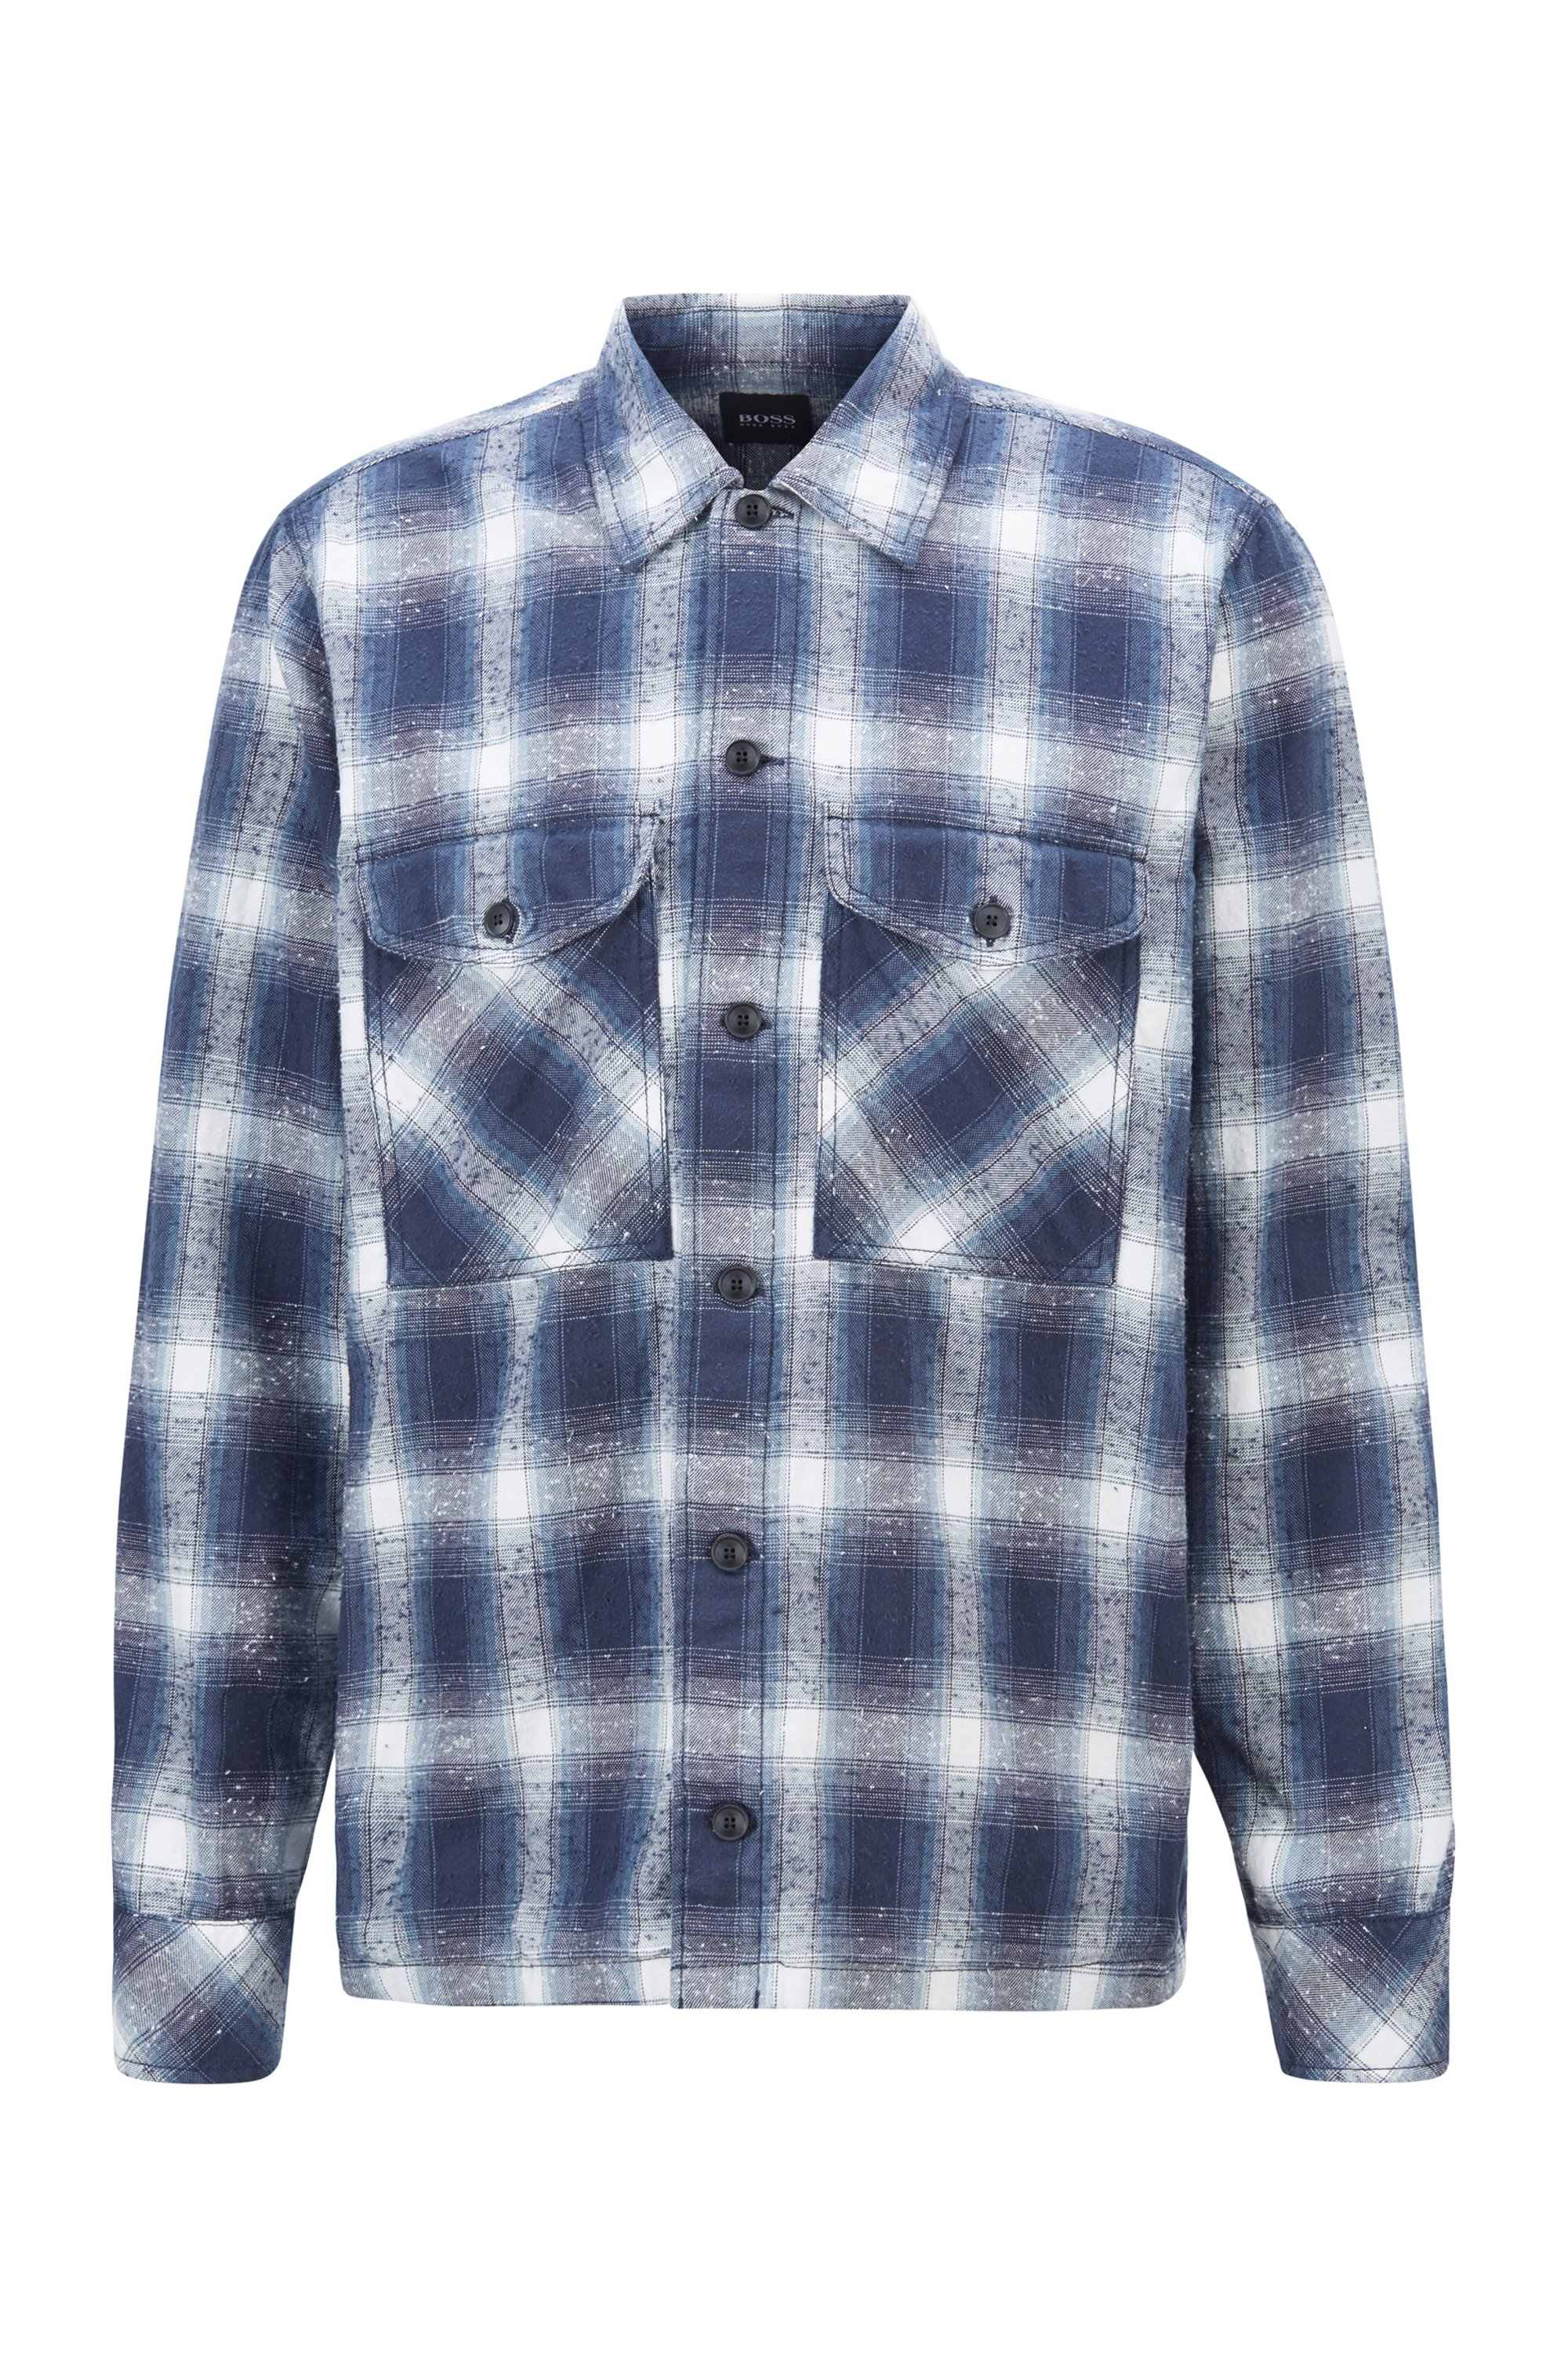 Kariertes Oversized Hemd aus strukturiertem Baumwoll-Jacquard, Blau gemustert